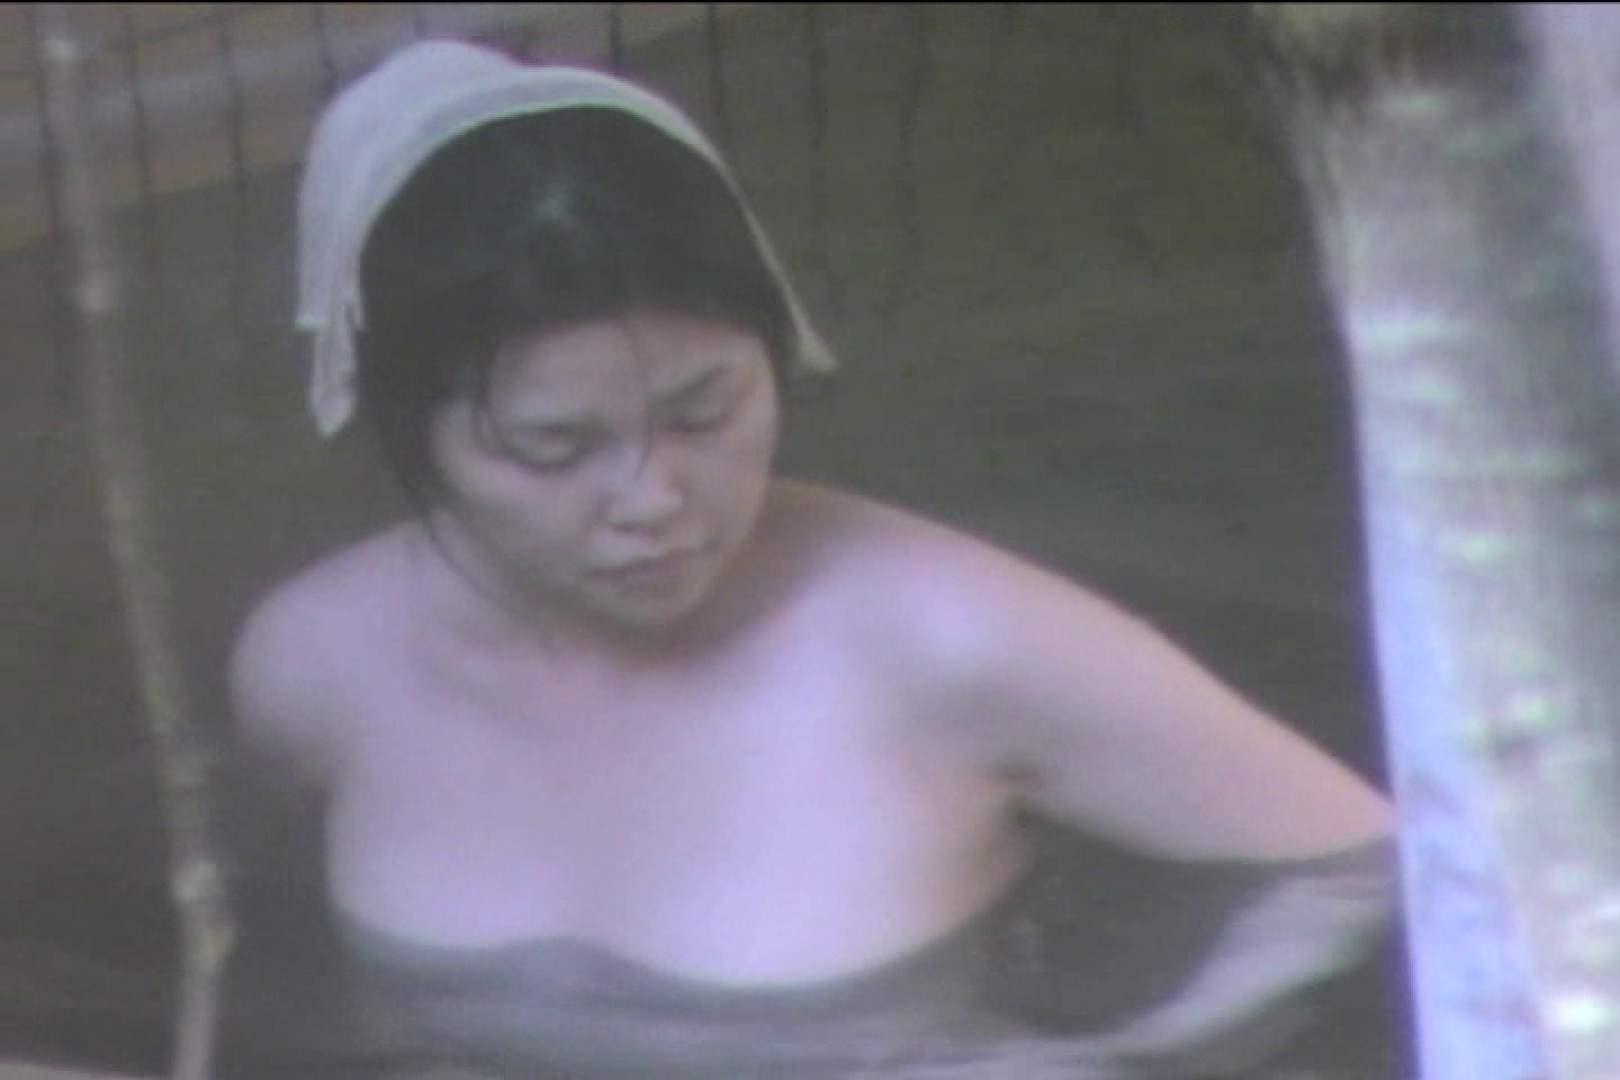 Aquaな露天風呂Vol.451 露天 オメコ無修正動画無料 66画像 17